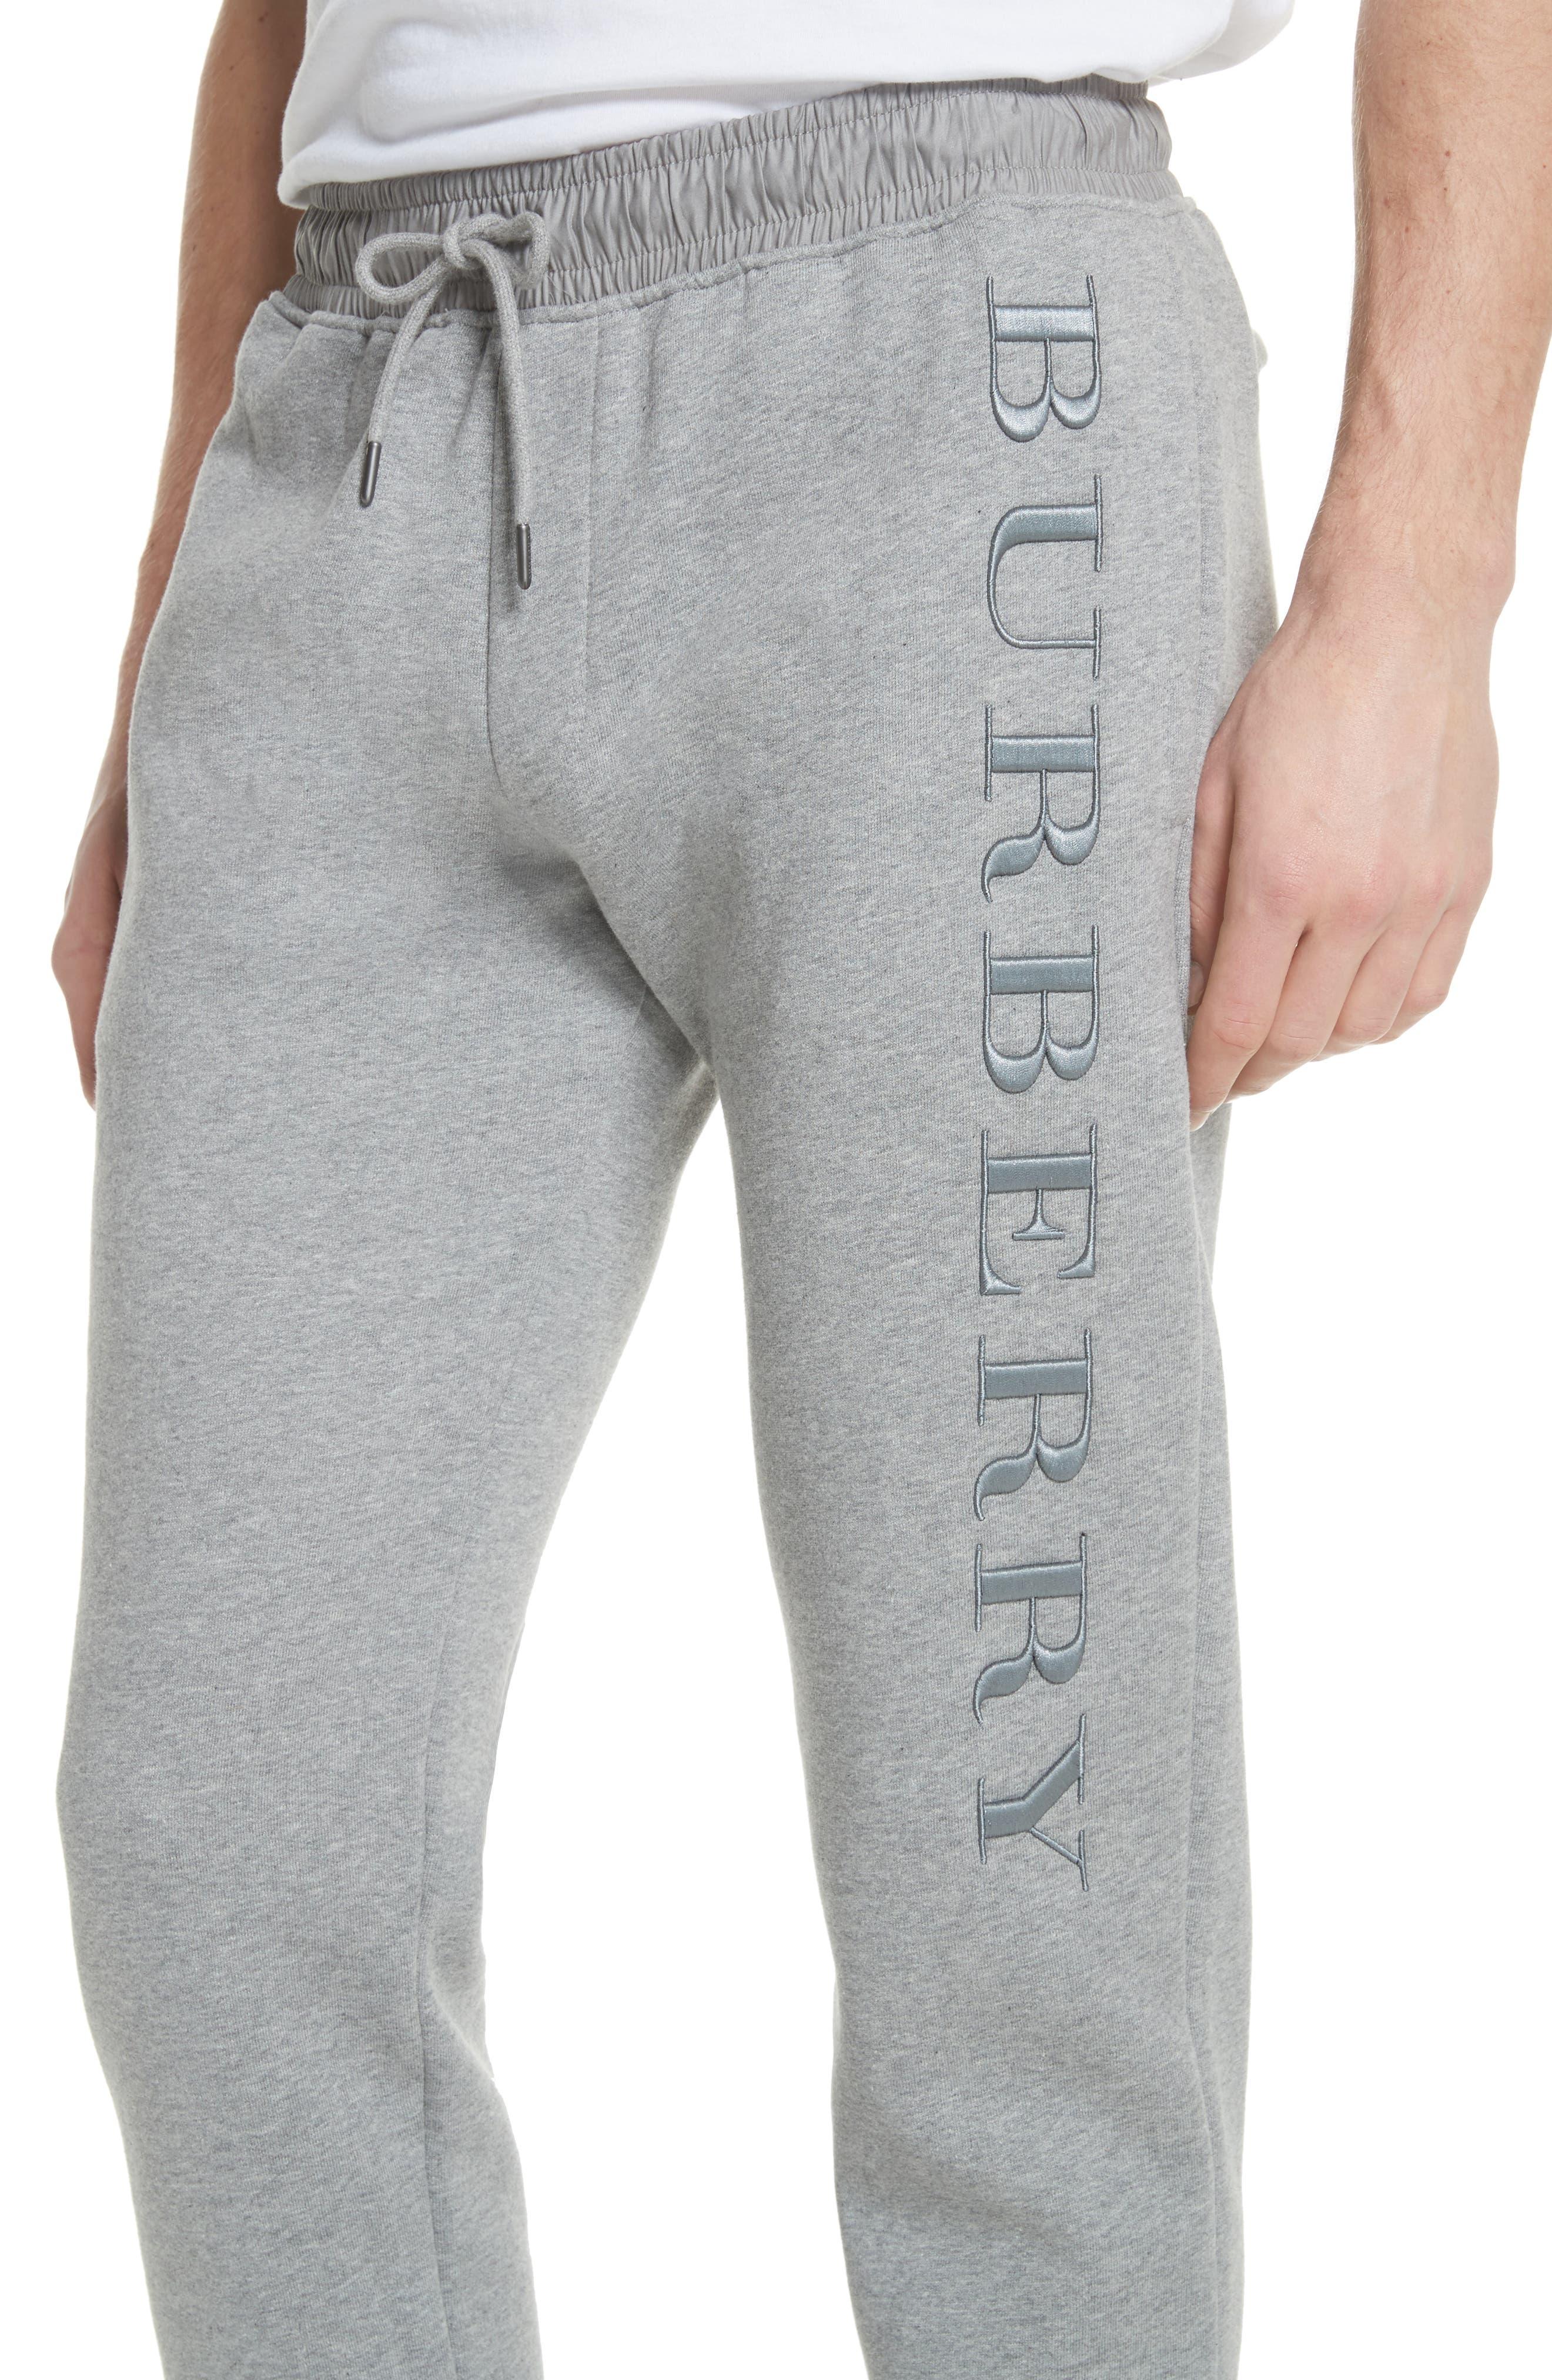 Nickford Lounge Pants,                             Alternate thumbnail 8, color,